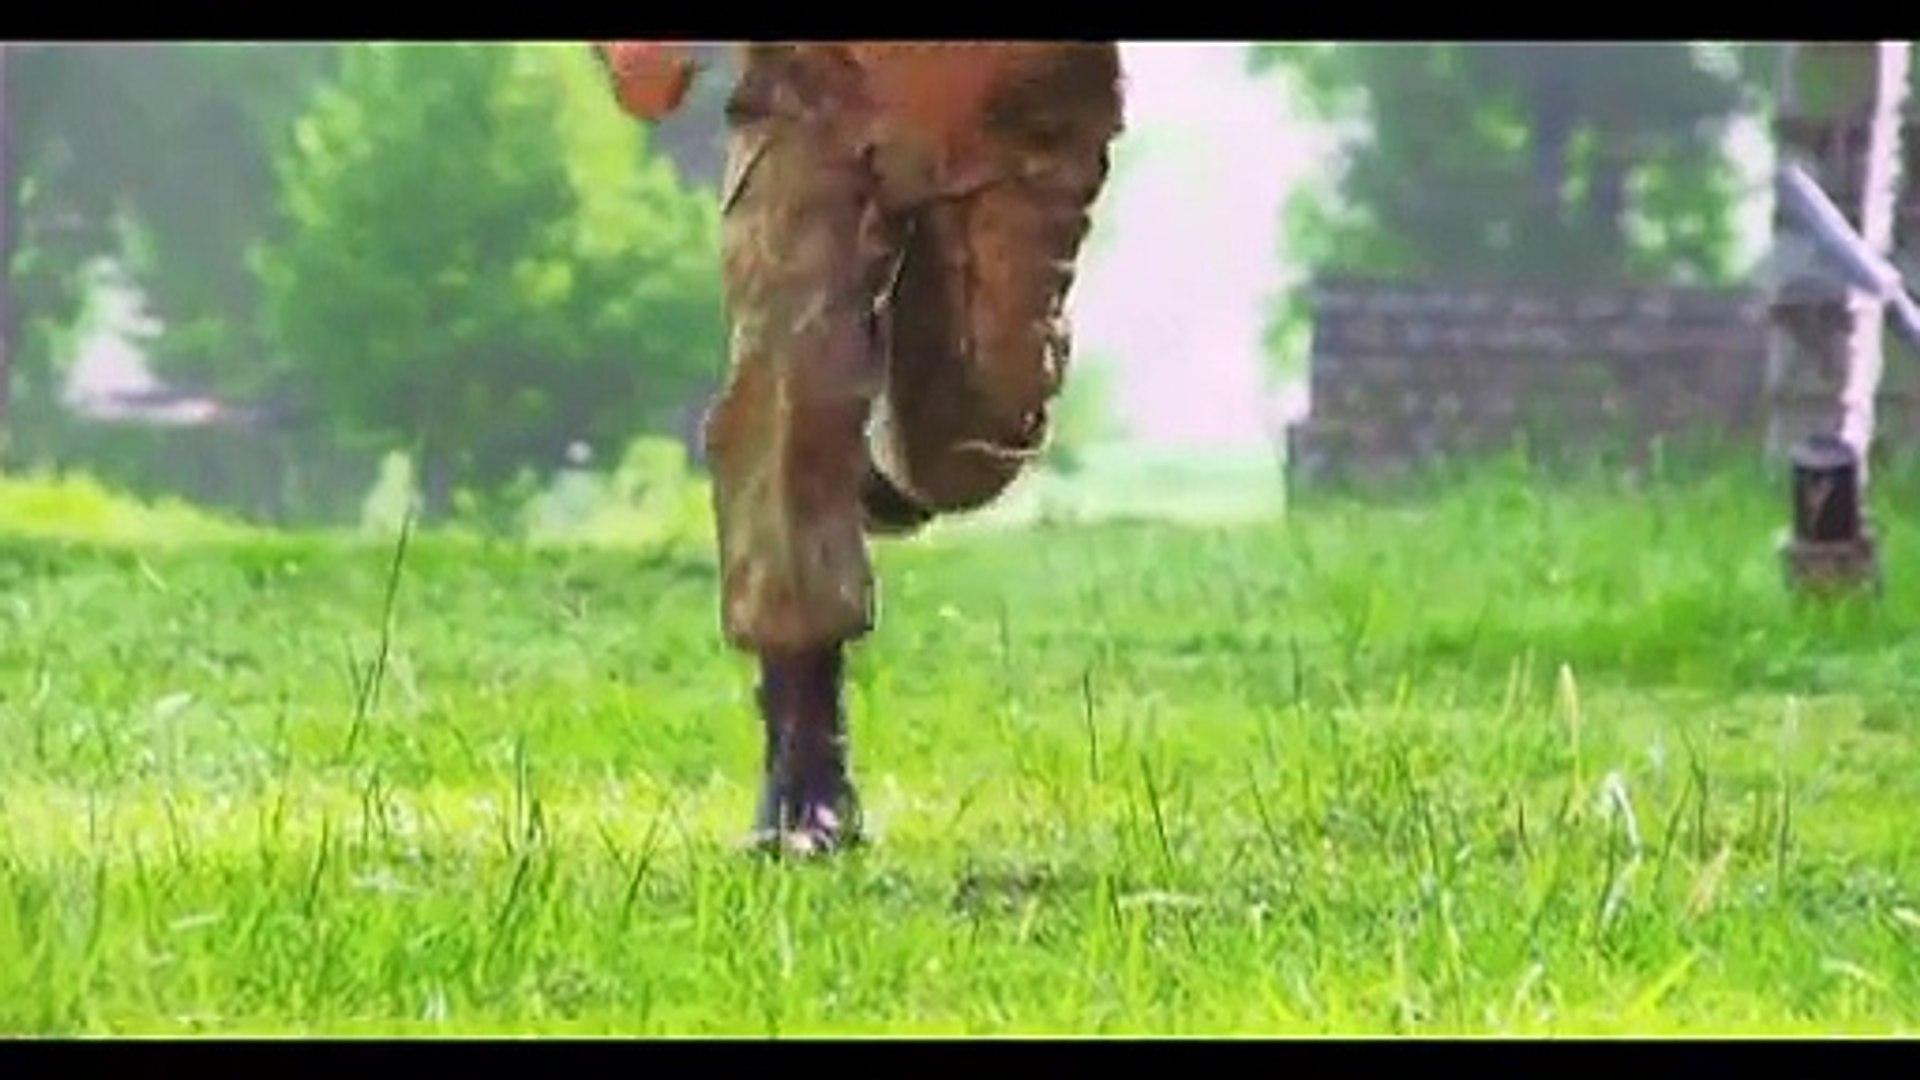 Defender ISPR documentary on Pakistan Armed Forces winner of Rome Film festival best documentary awa